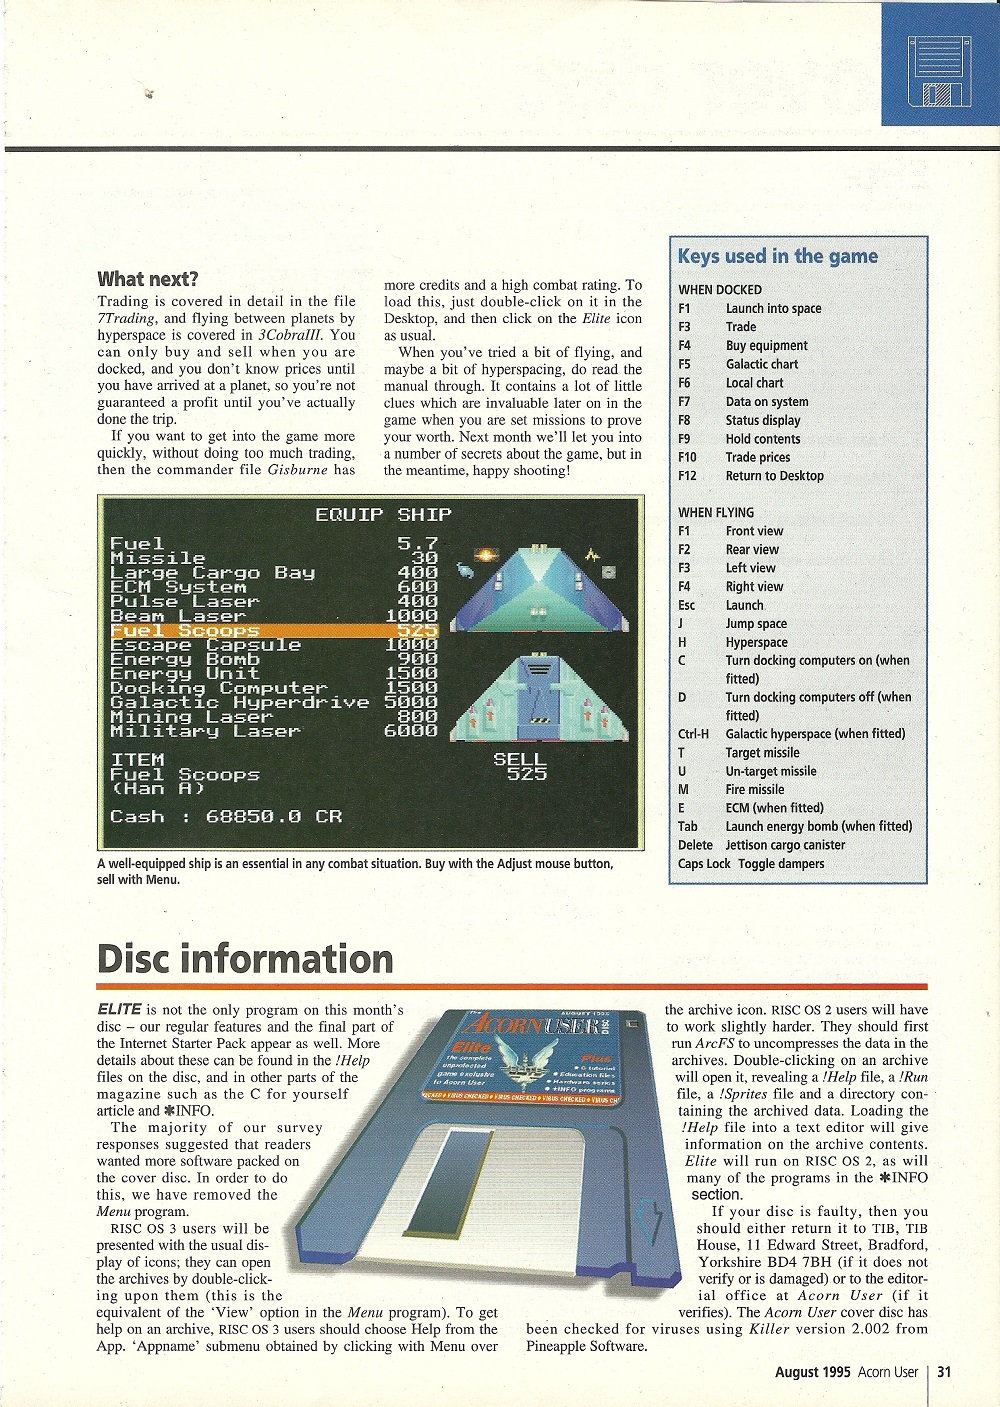 archimedes magazine article